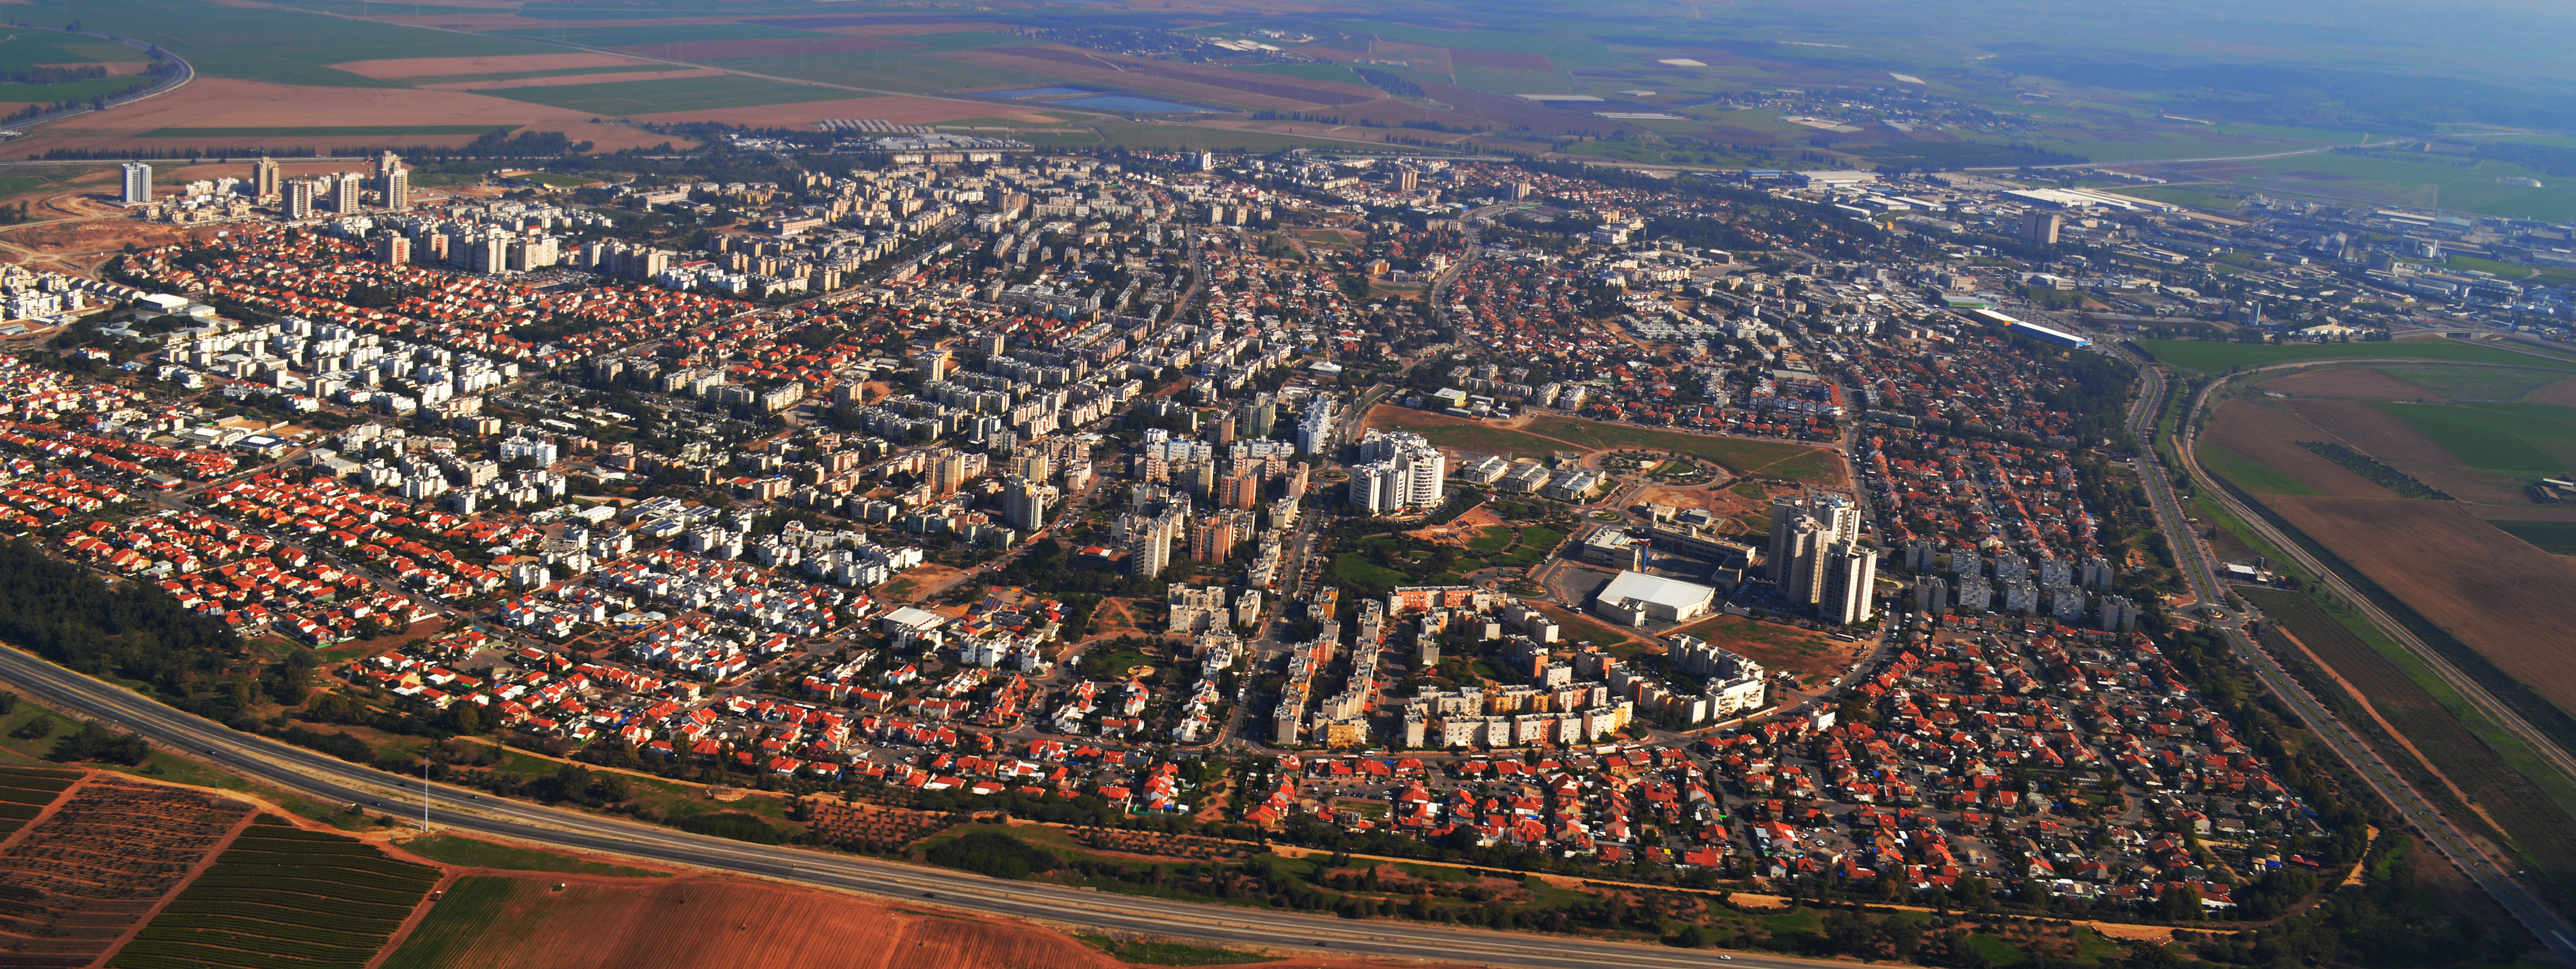 kiryat gat aerial view.jpg